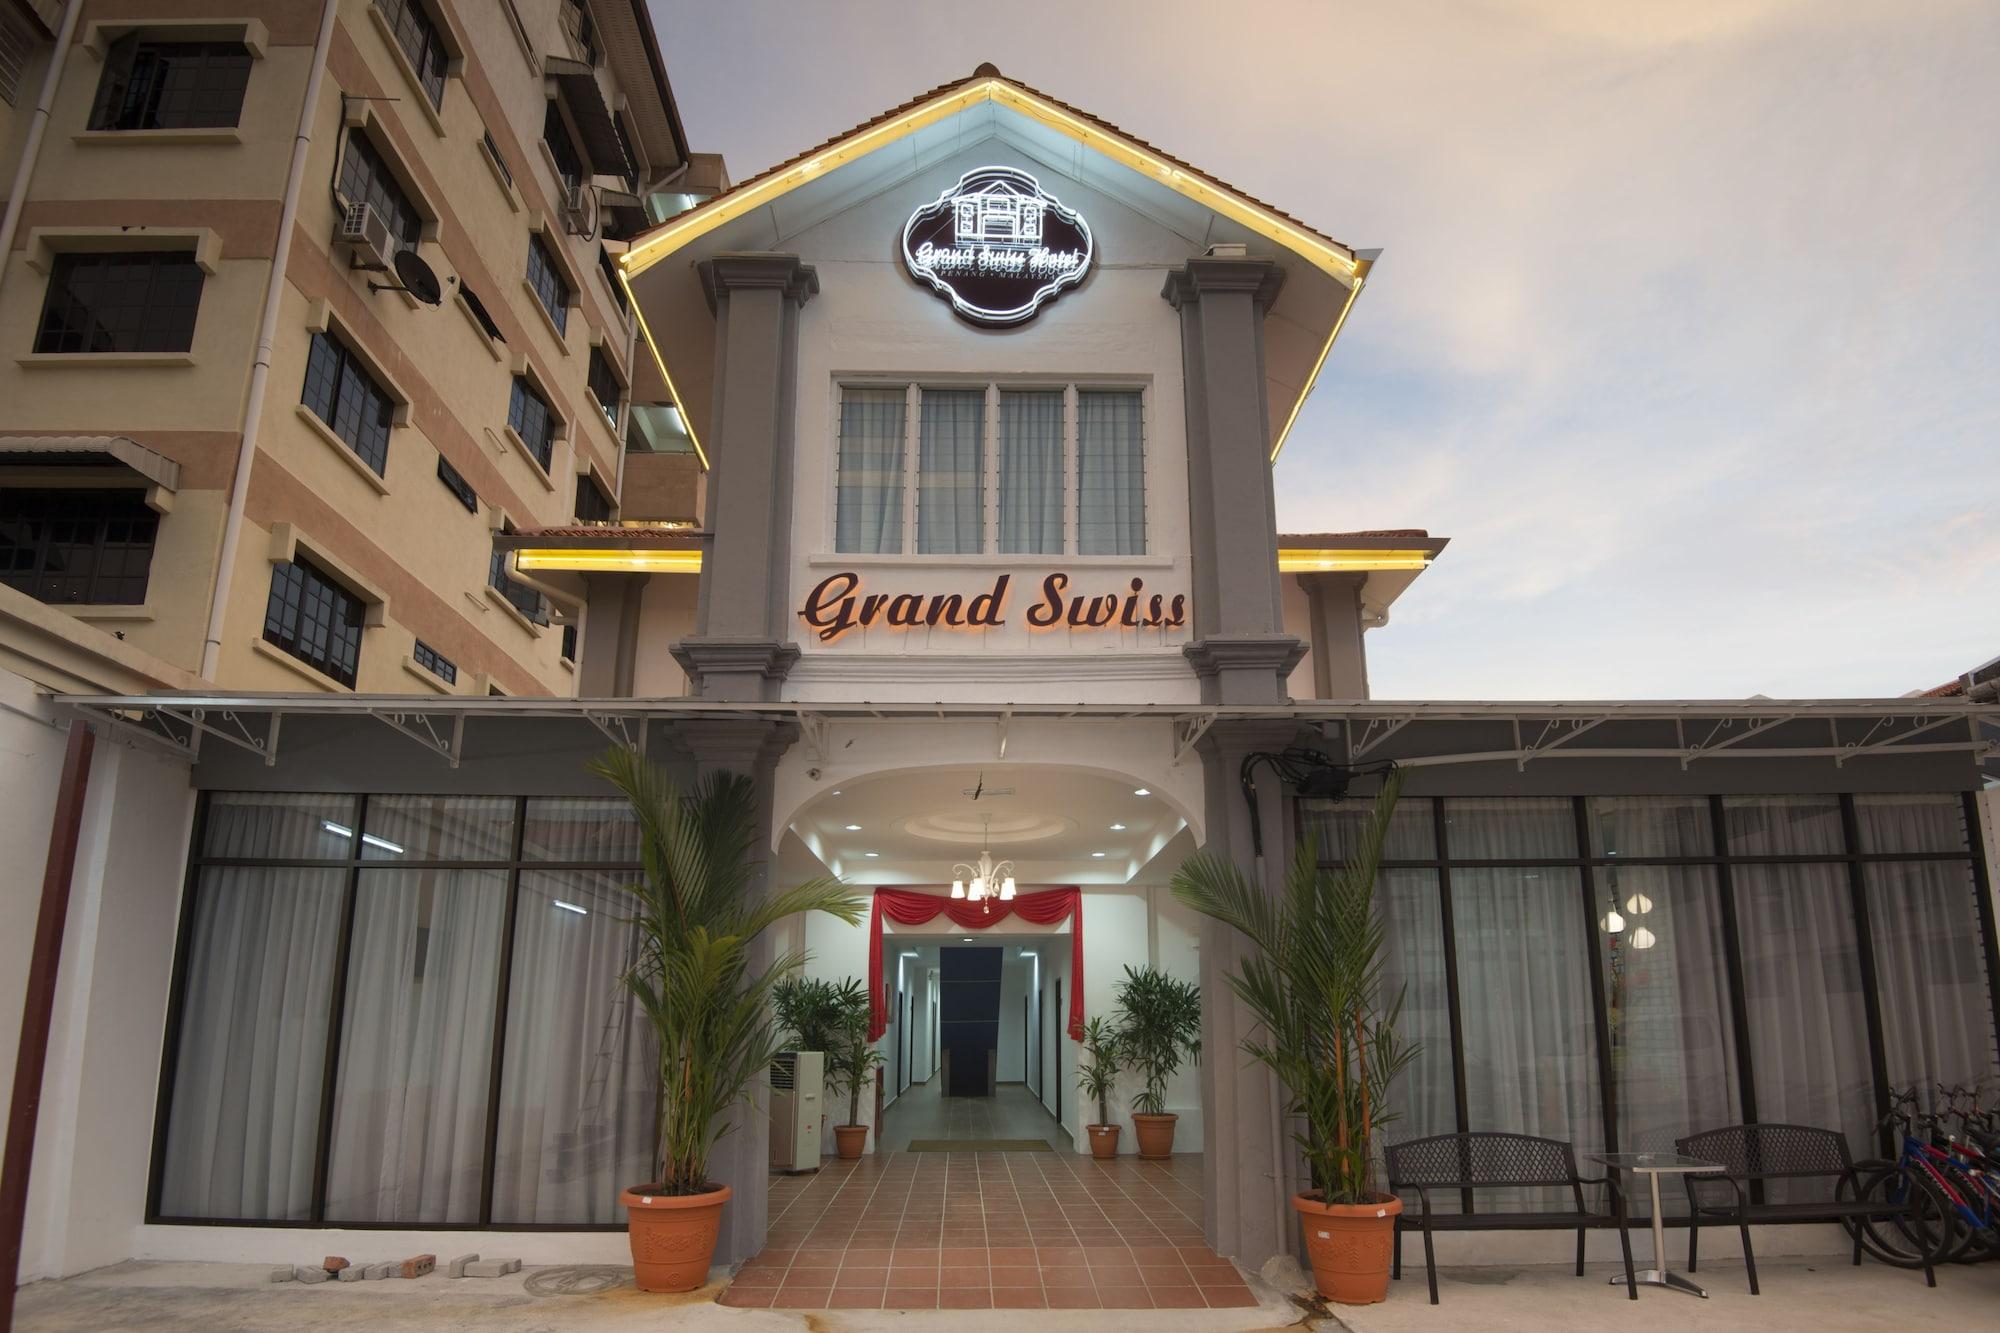 Grand Swiss Hotel @ Lebuh Chulia, Pulau Penang